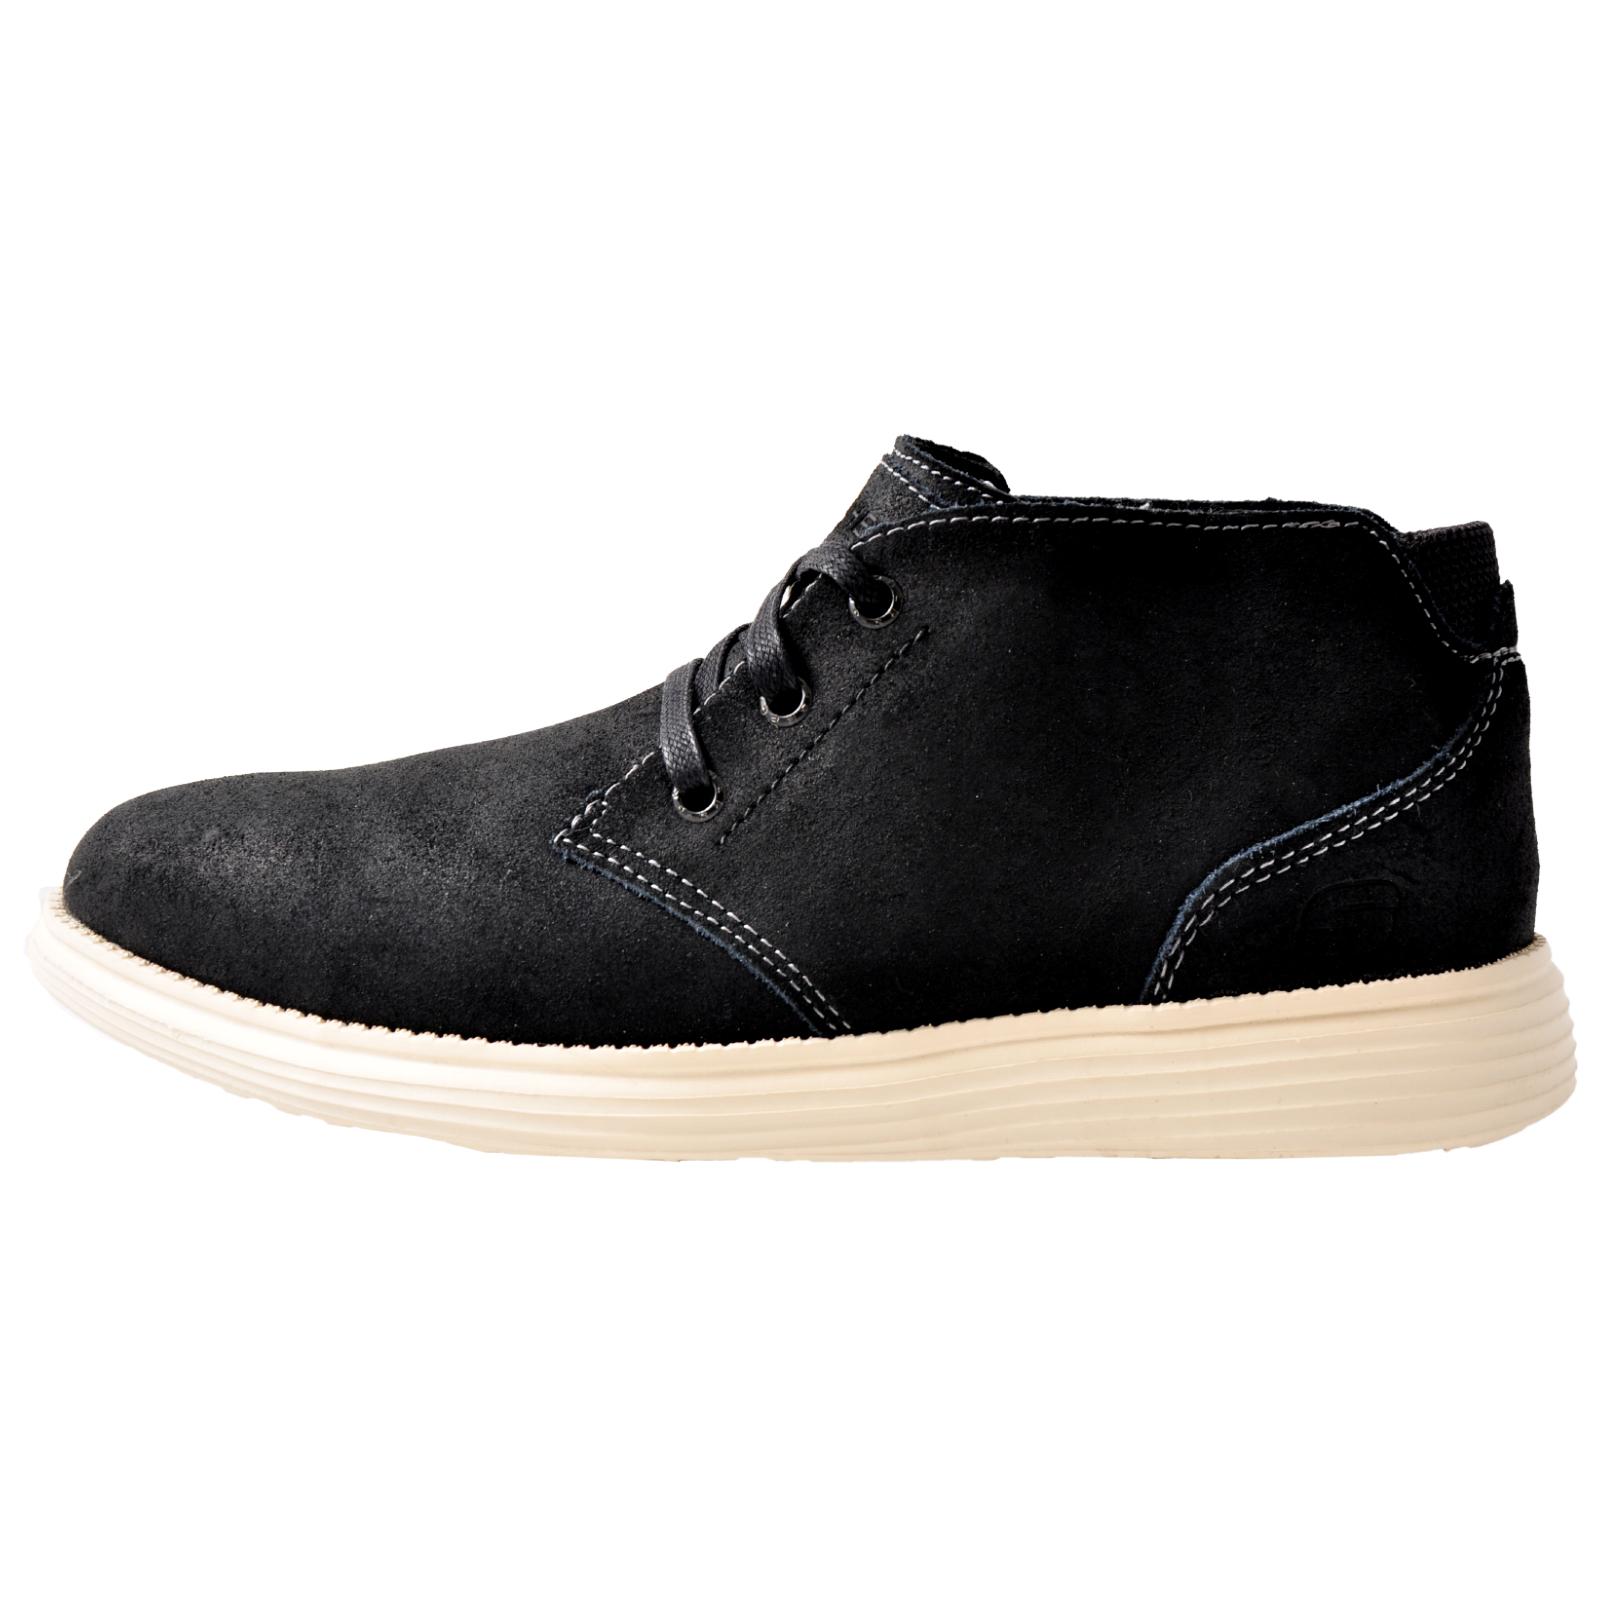 a148118e1edce Skechers Status-Rolano Men s Memory Foam Smart Leather Chukka Ankle ...